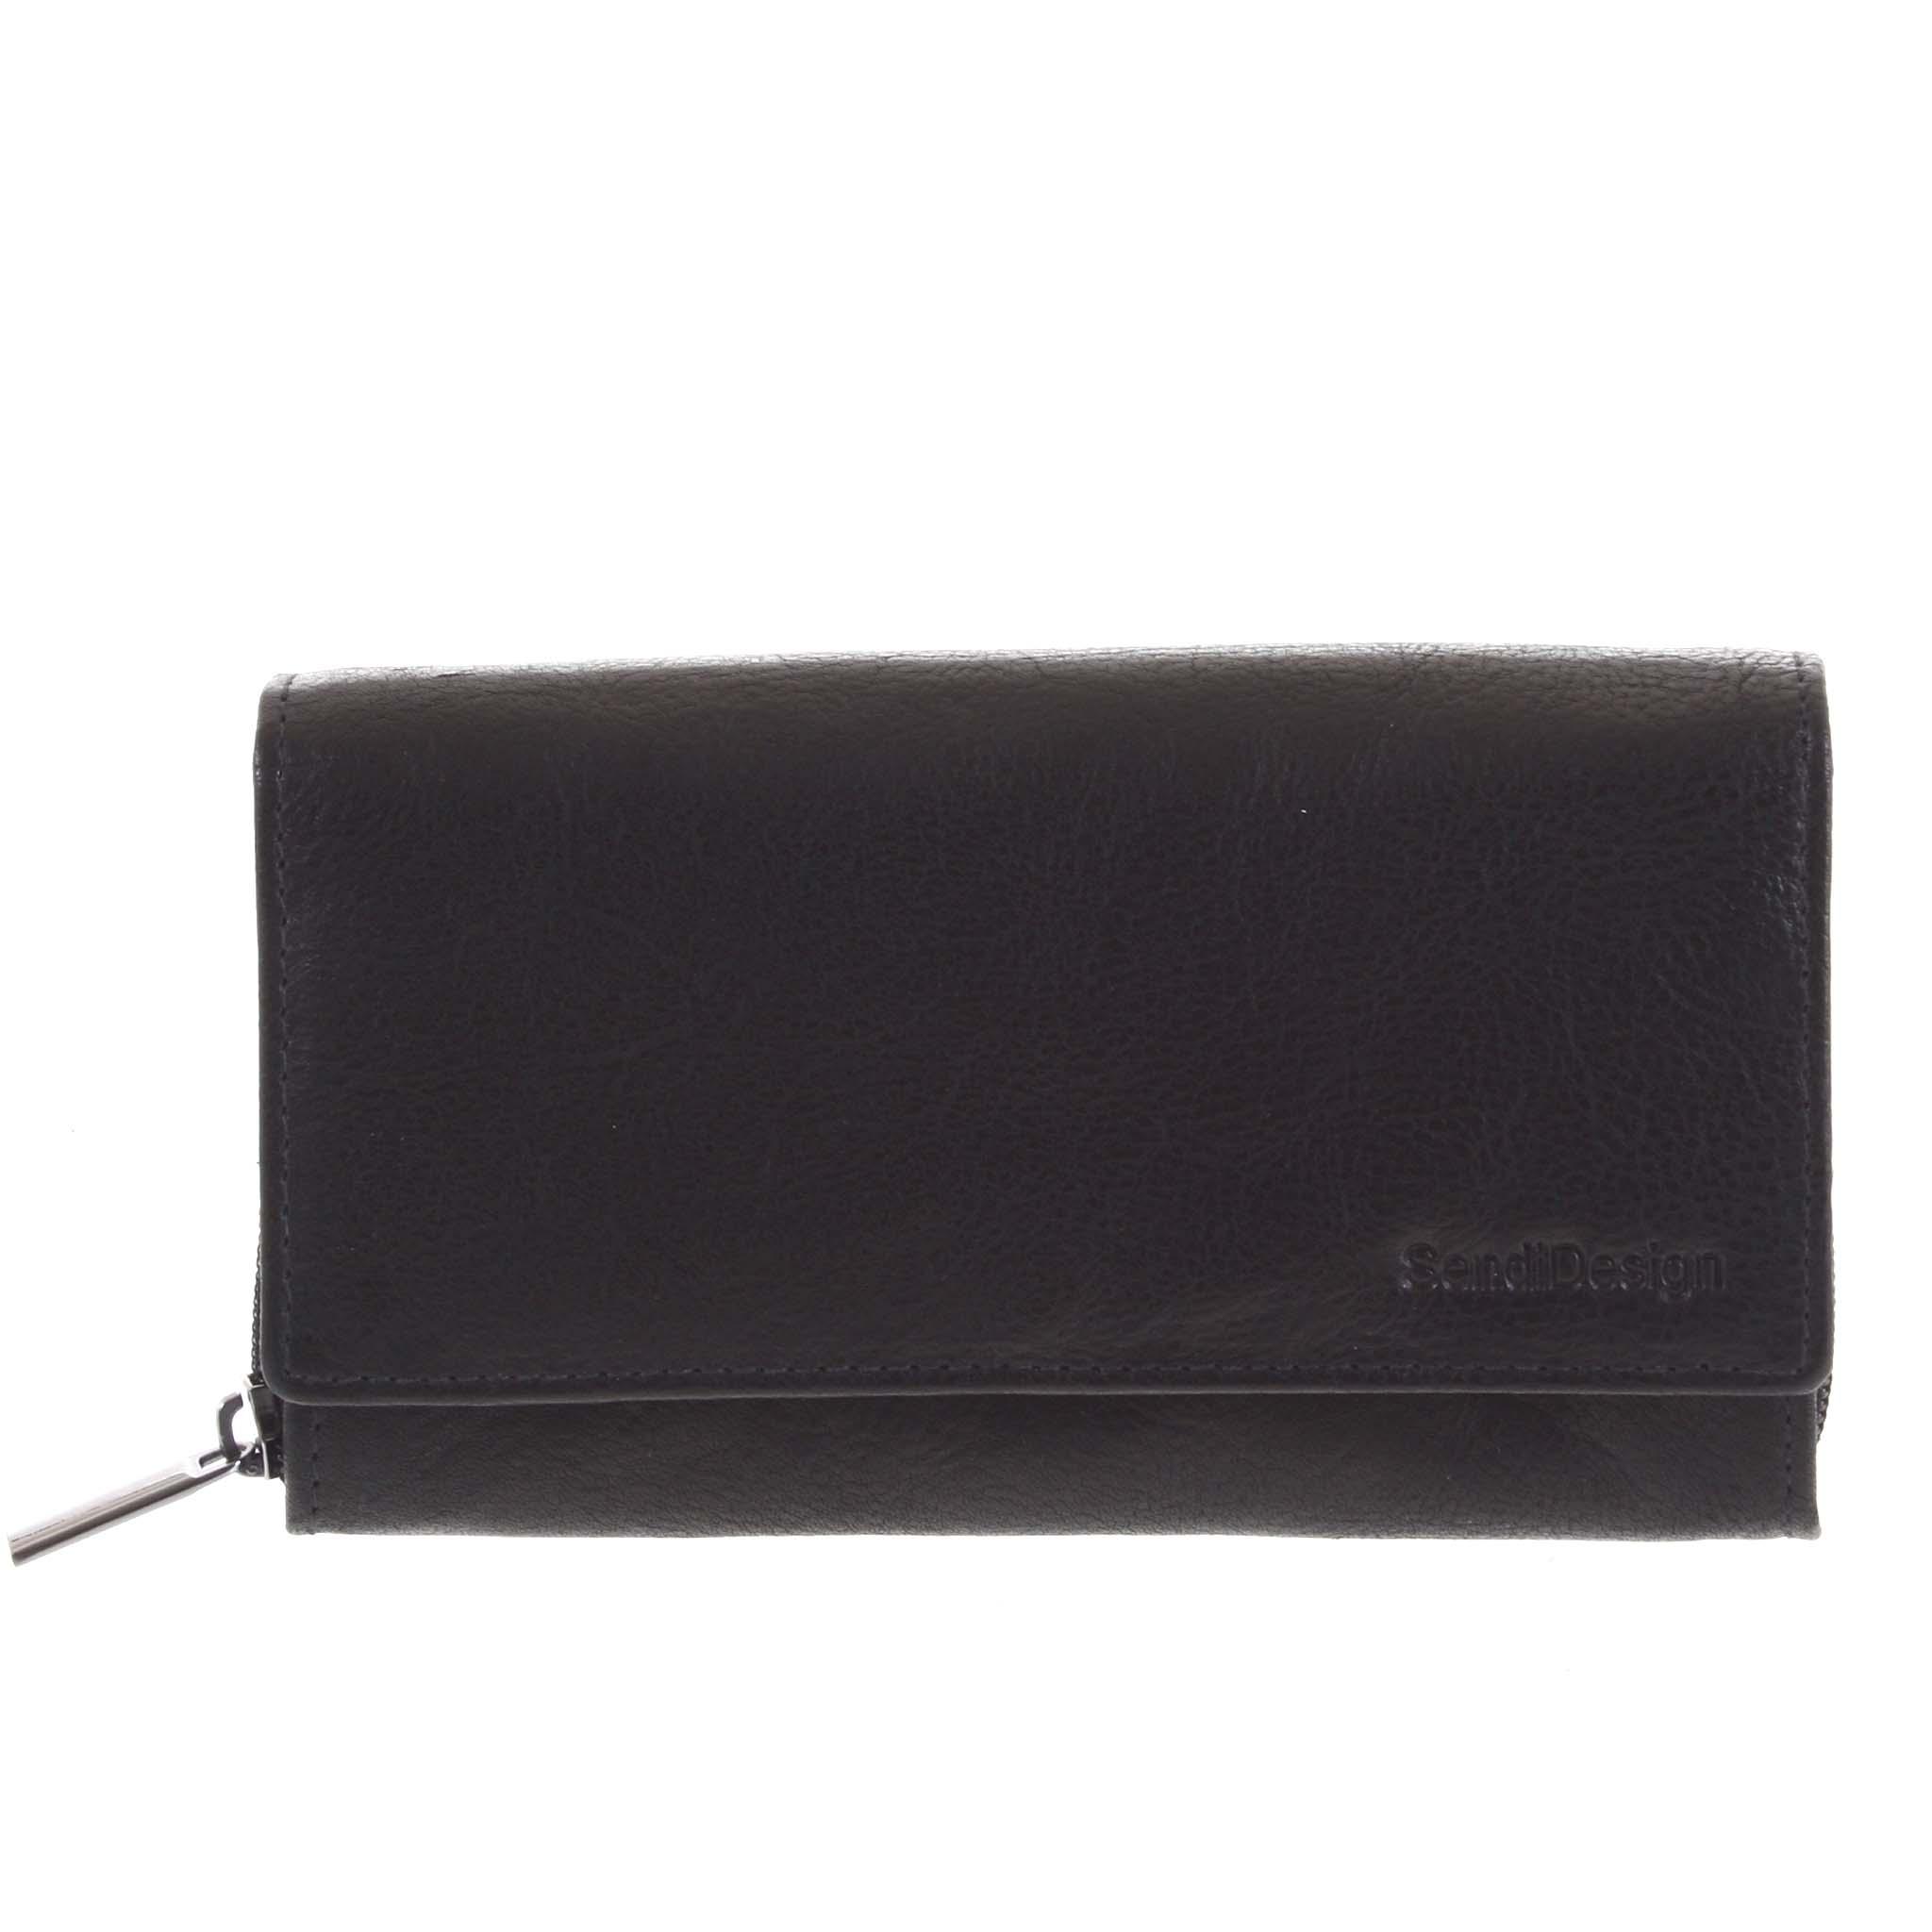 Dámska kožená peňaženka čierna - SendiDesign Zimbie